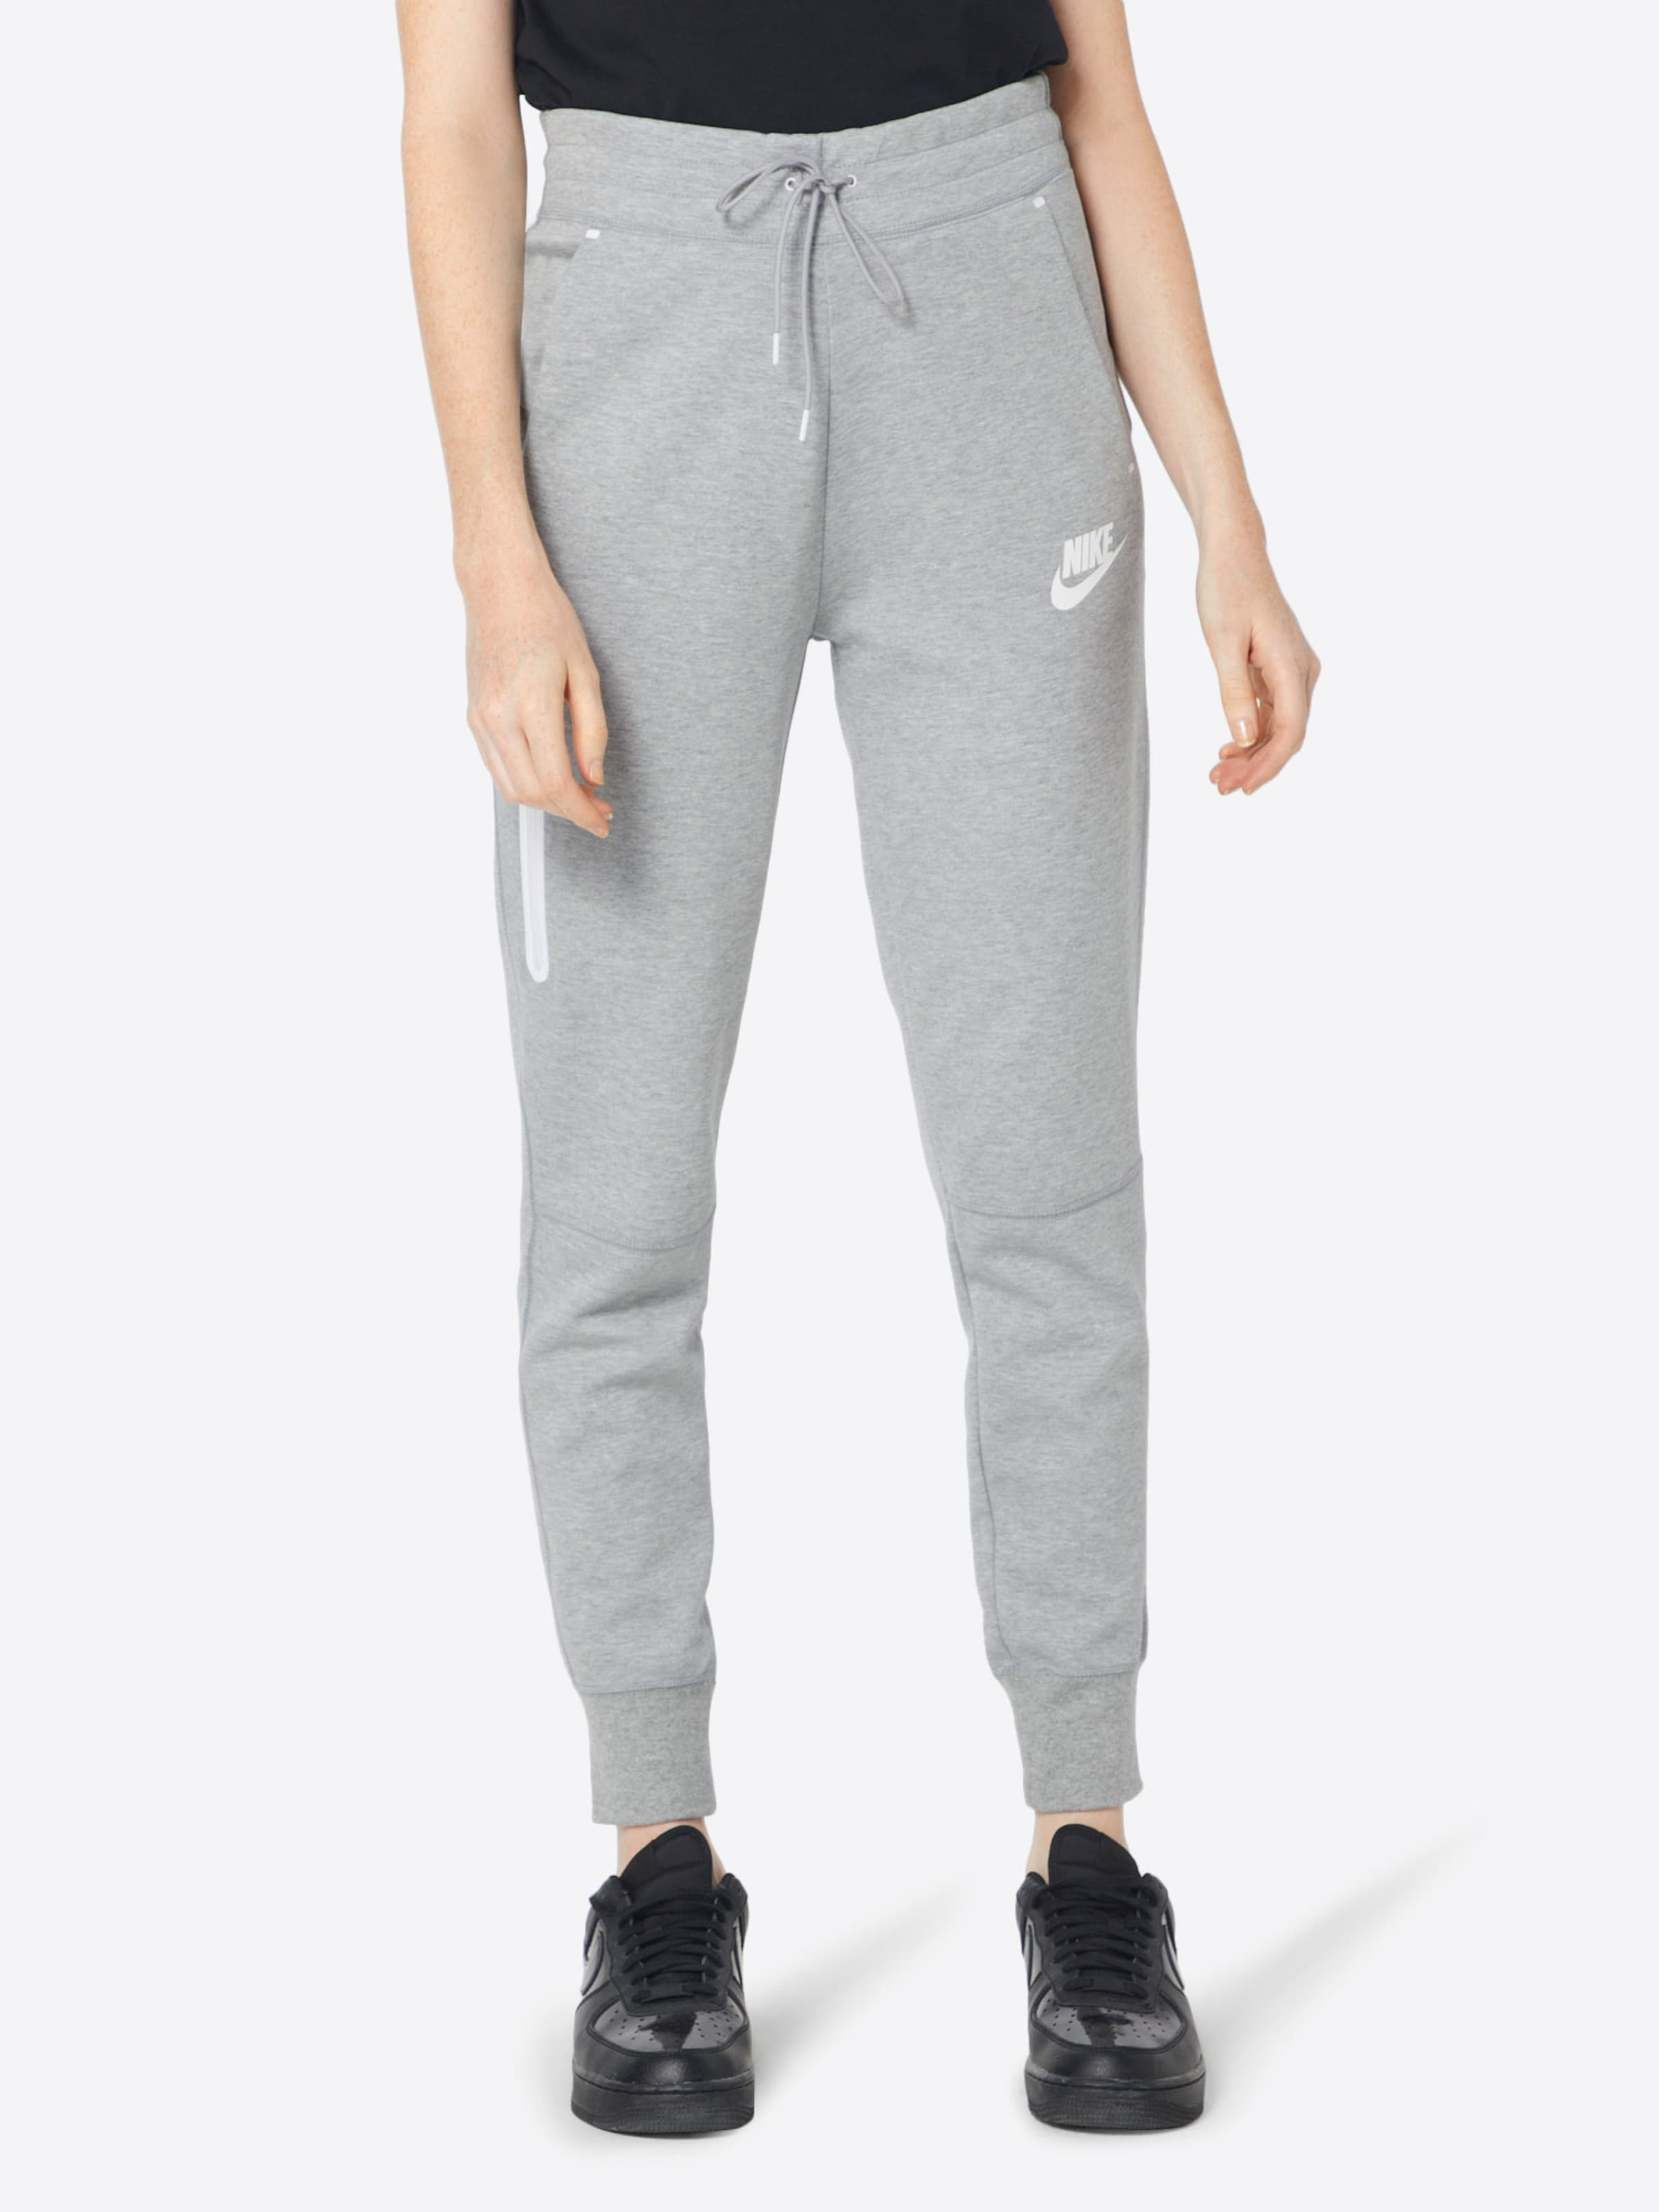 Hose Nike GrauWeiß Sportswear Nike In dxrChstQ